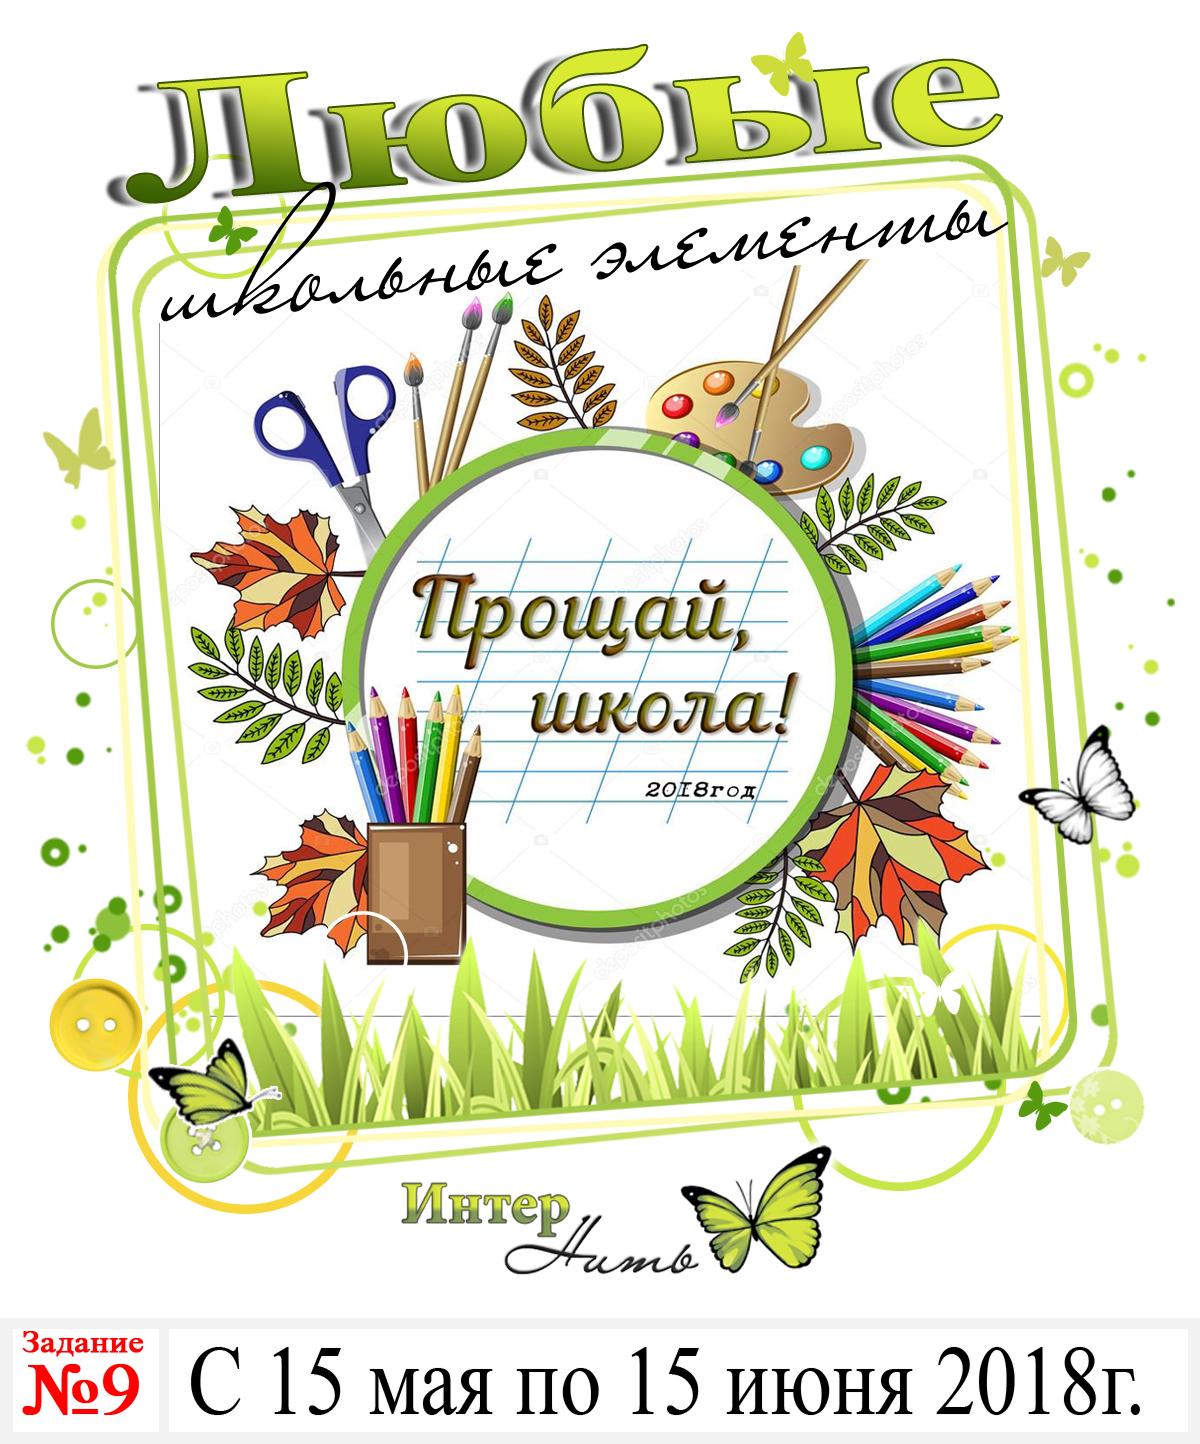 """Школьные элементы"" (С 15.05.18г. по 15.06.18г.)."